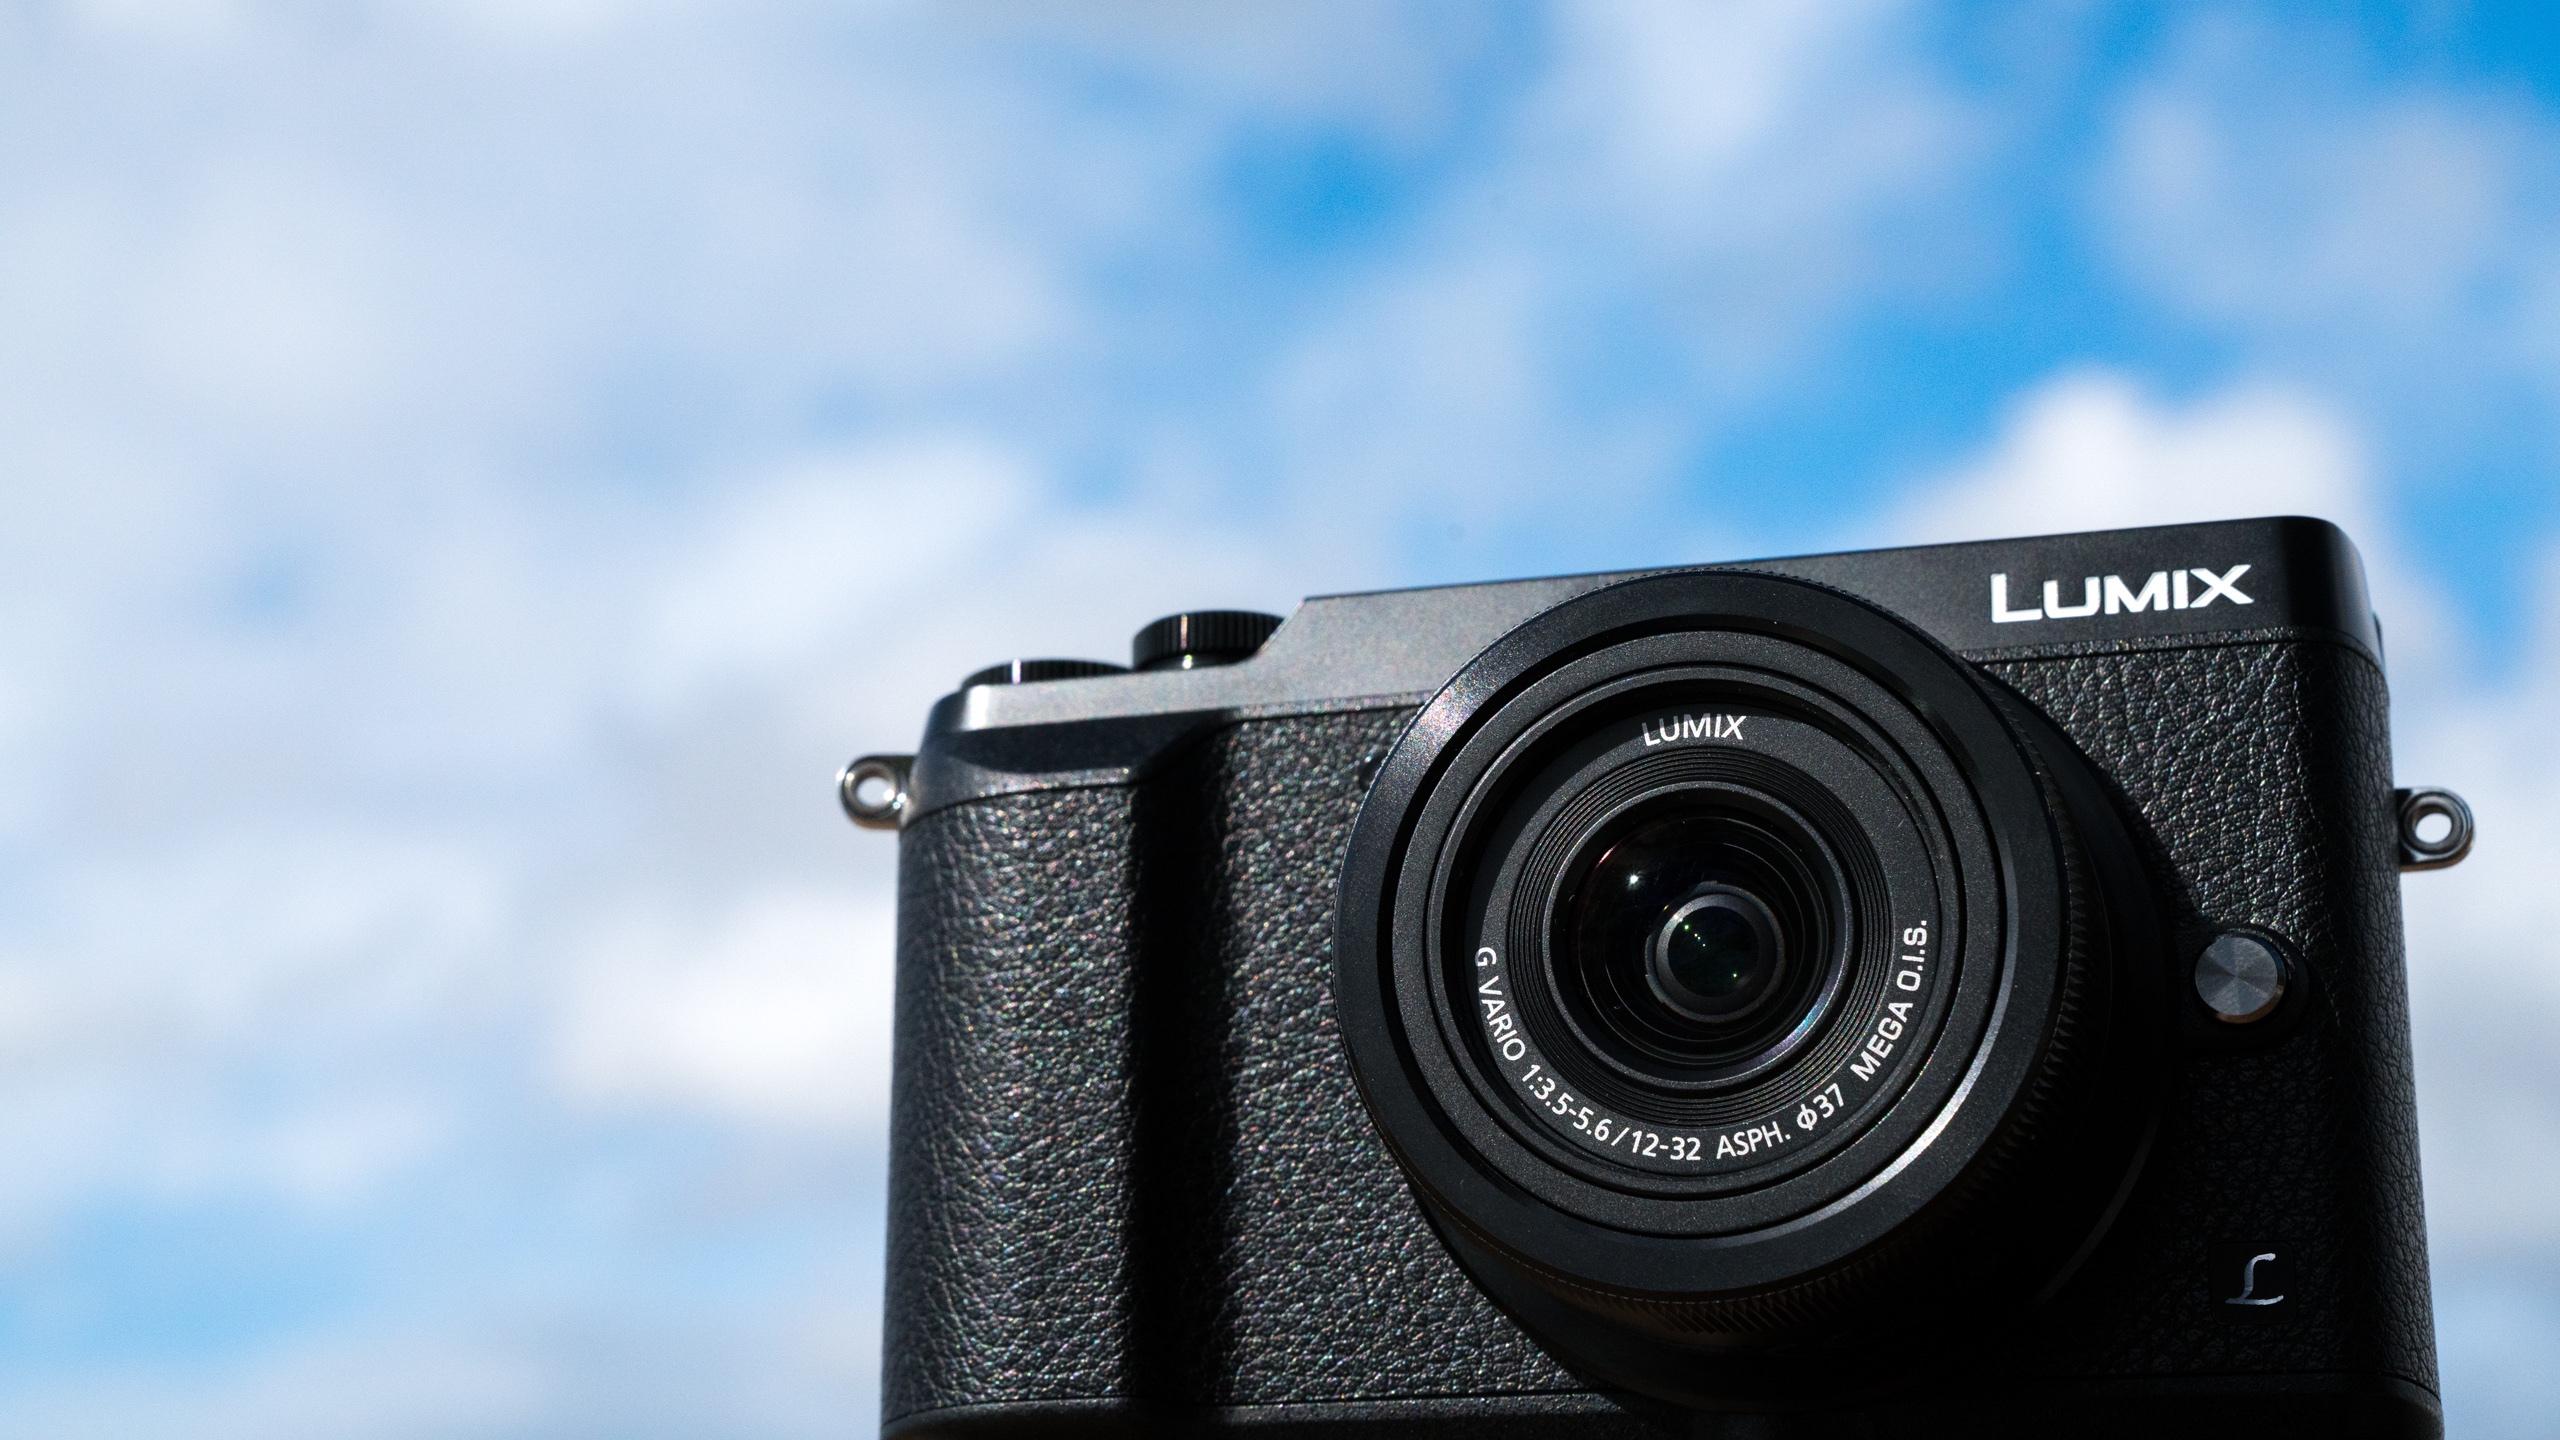 Panasonic Lumix Gx85 Dc Gf10 Kit 12 32mm Kamera Mirrorless Black G7 The Peak Foto